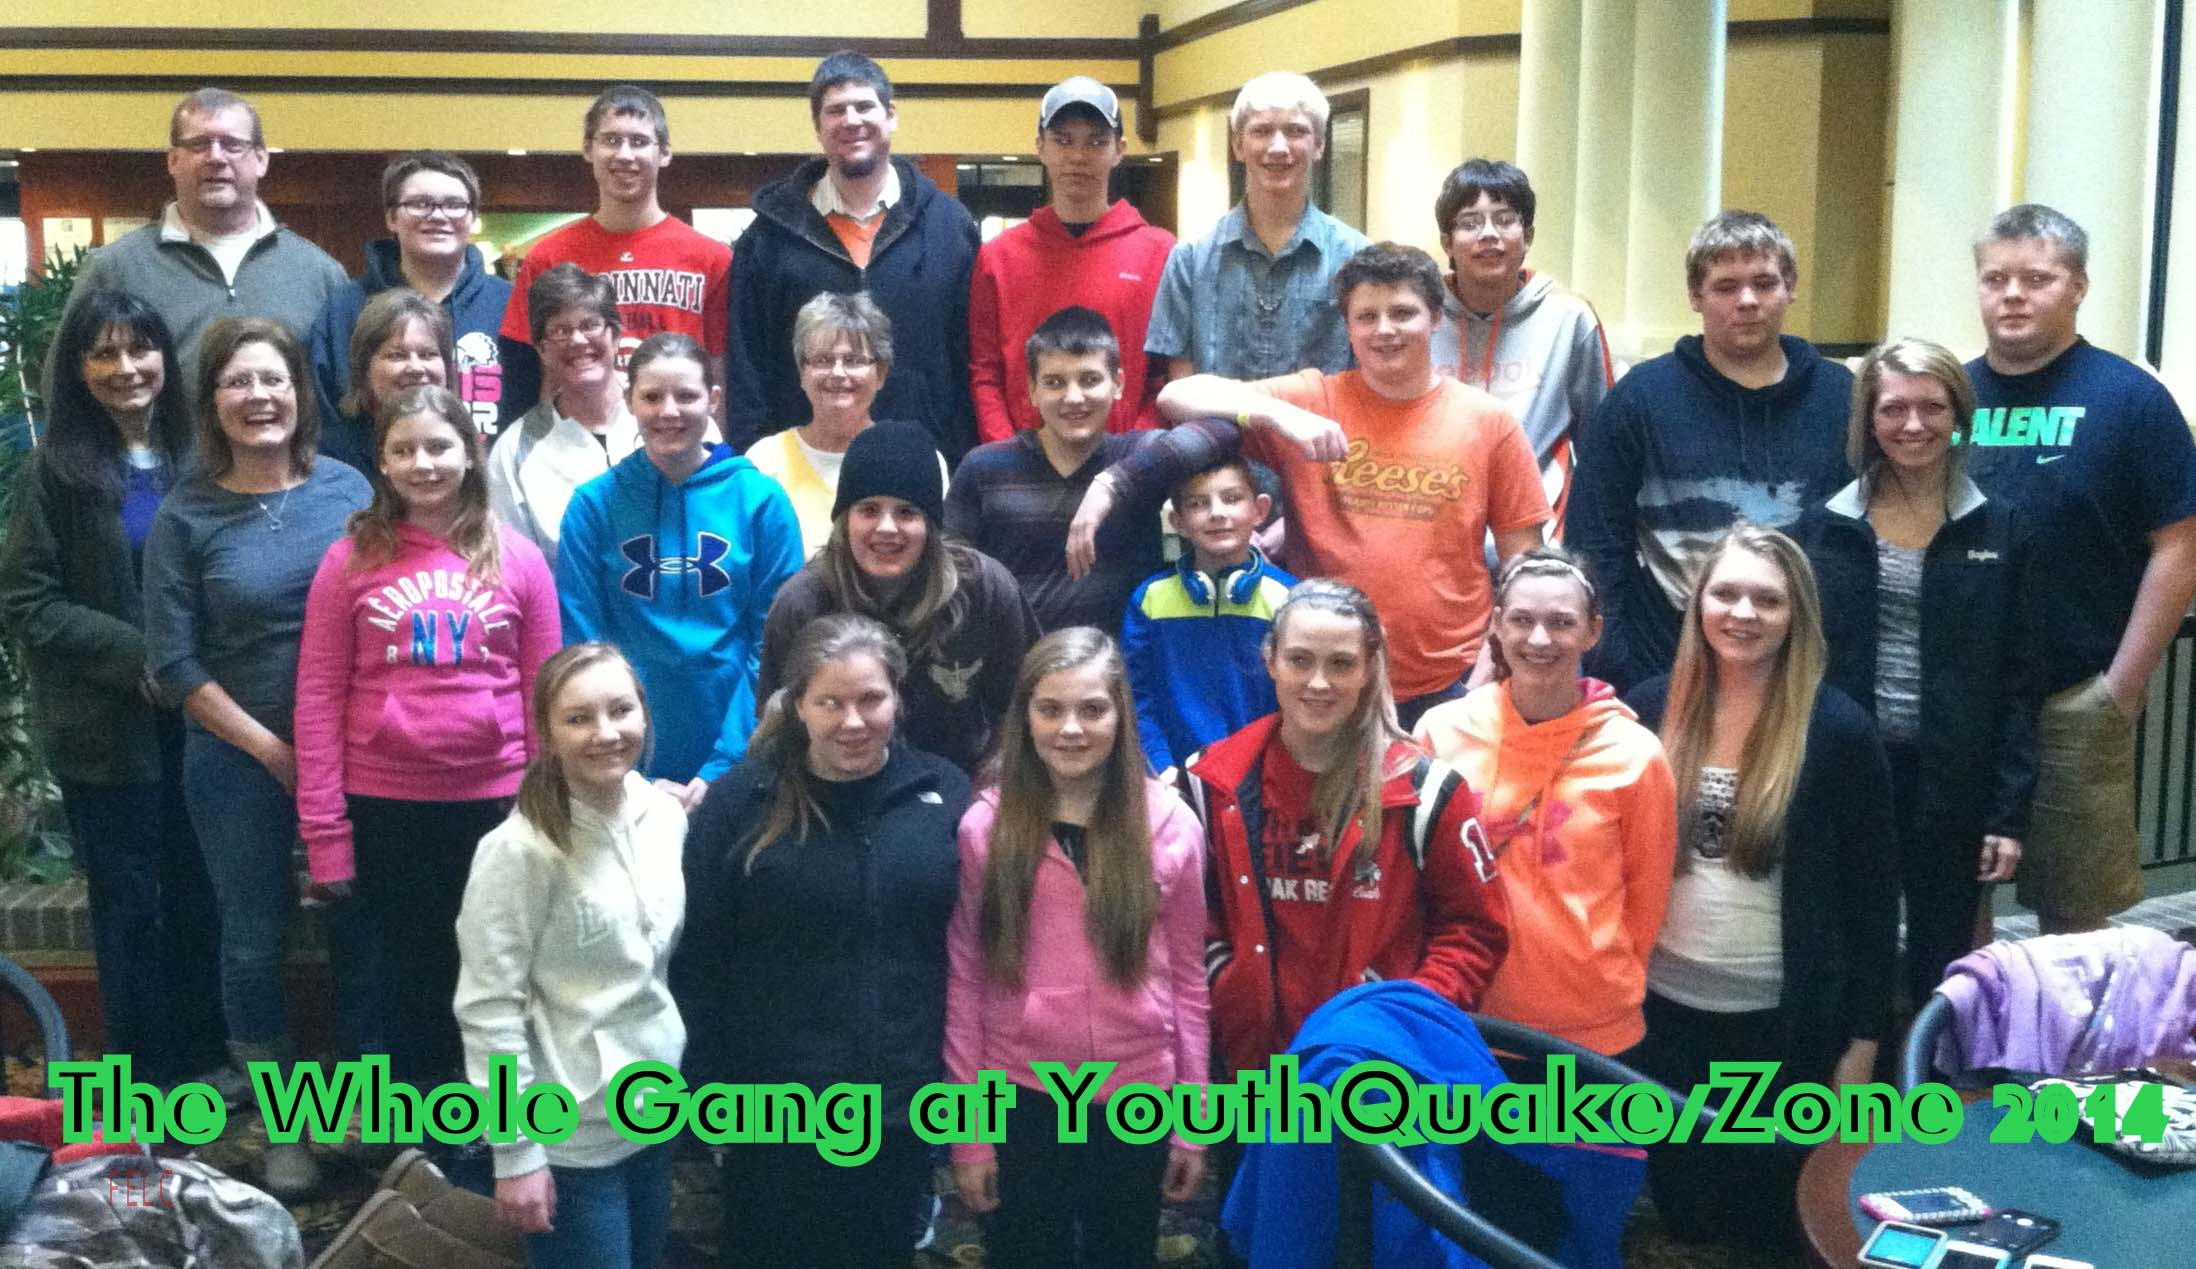 Youth Quake 2014